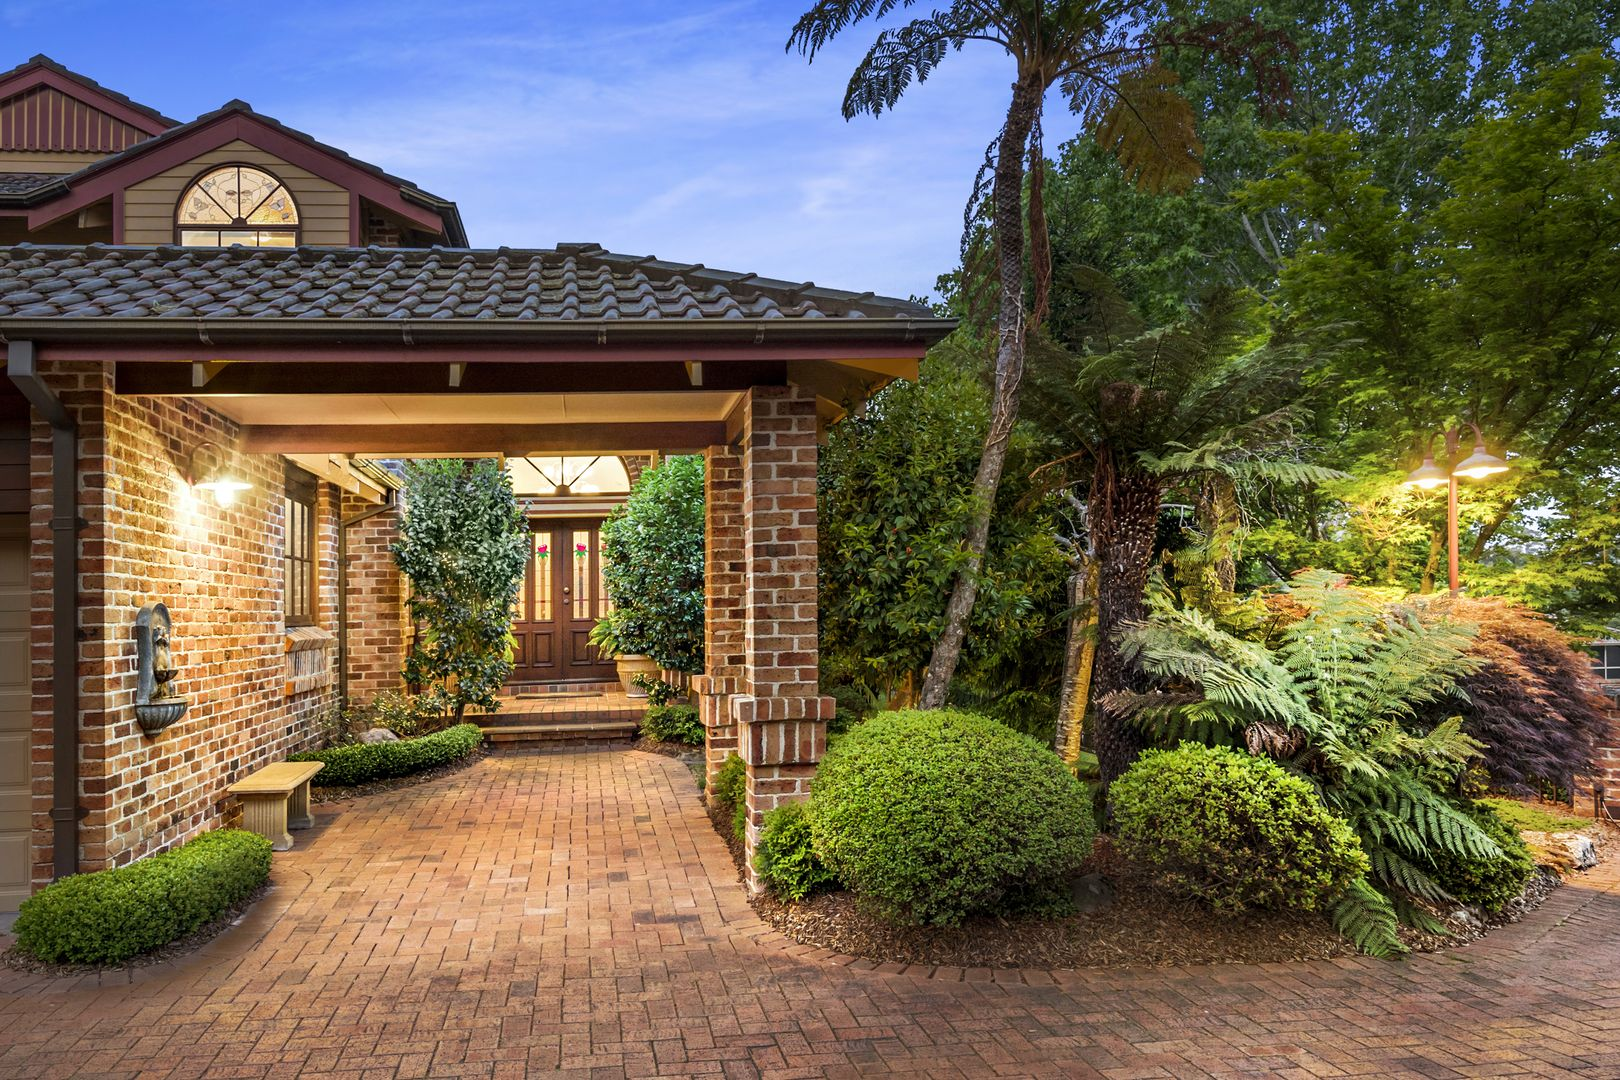 54-58 Wellington Drive, Balgownie NSW 2519, Image 0